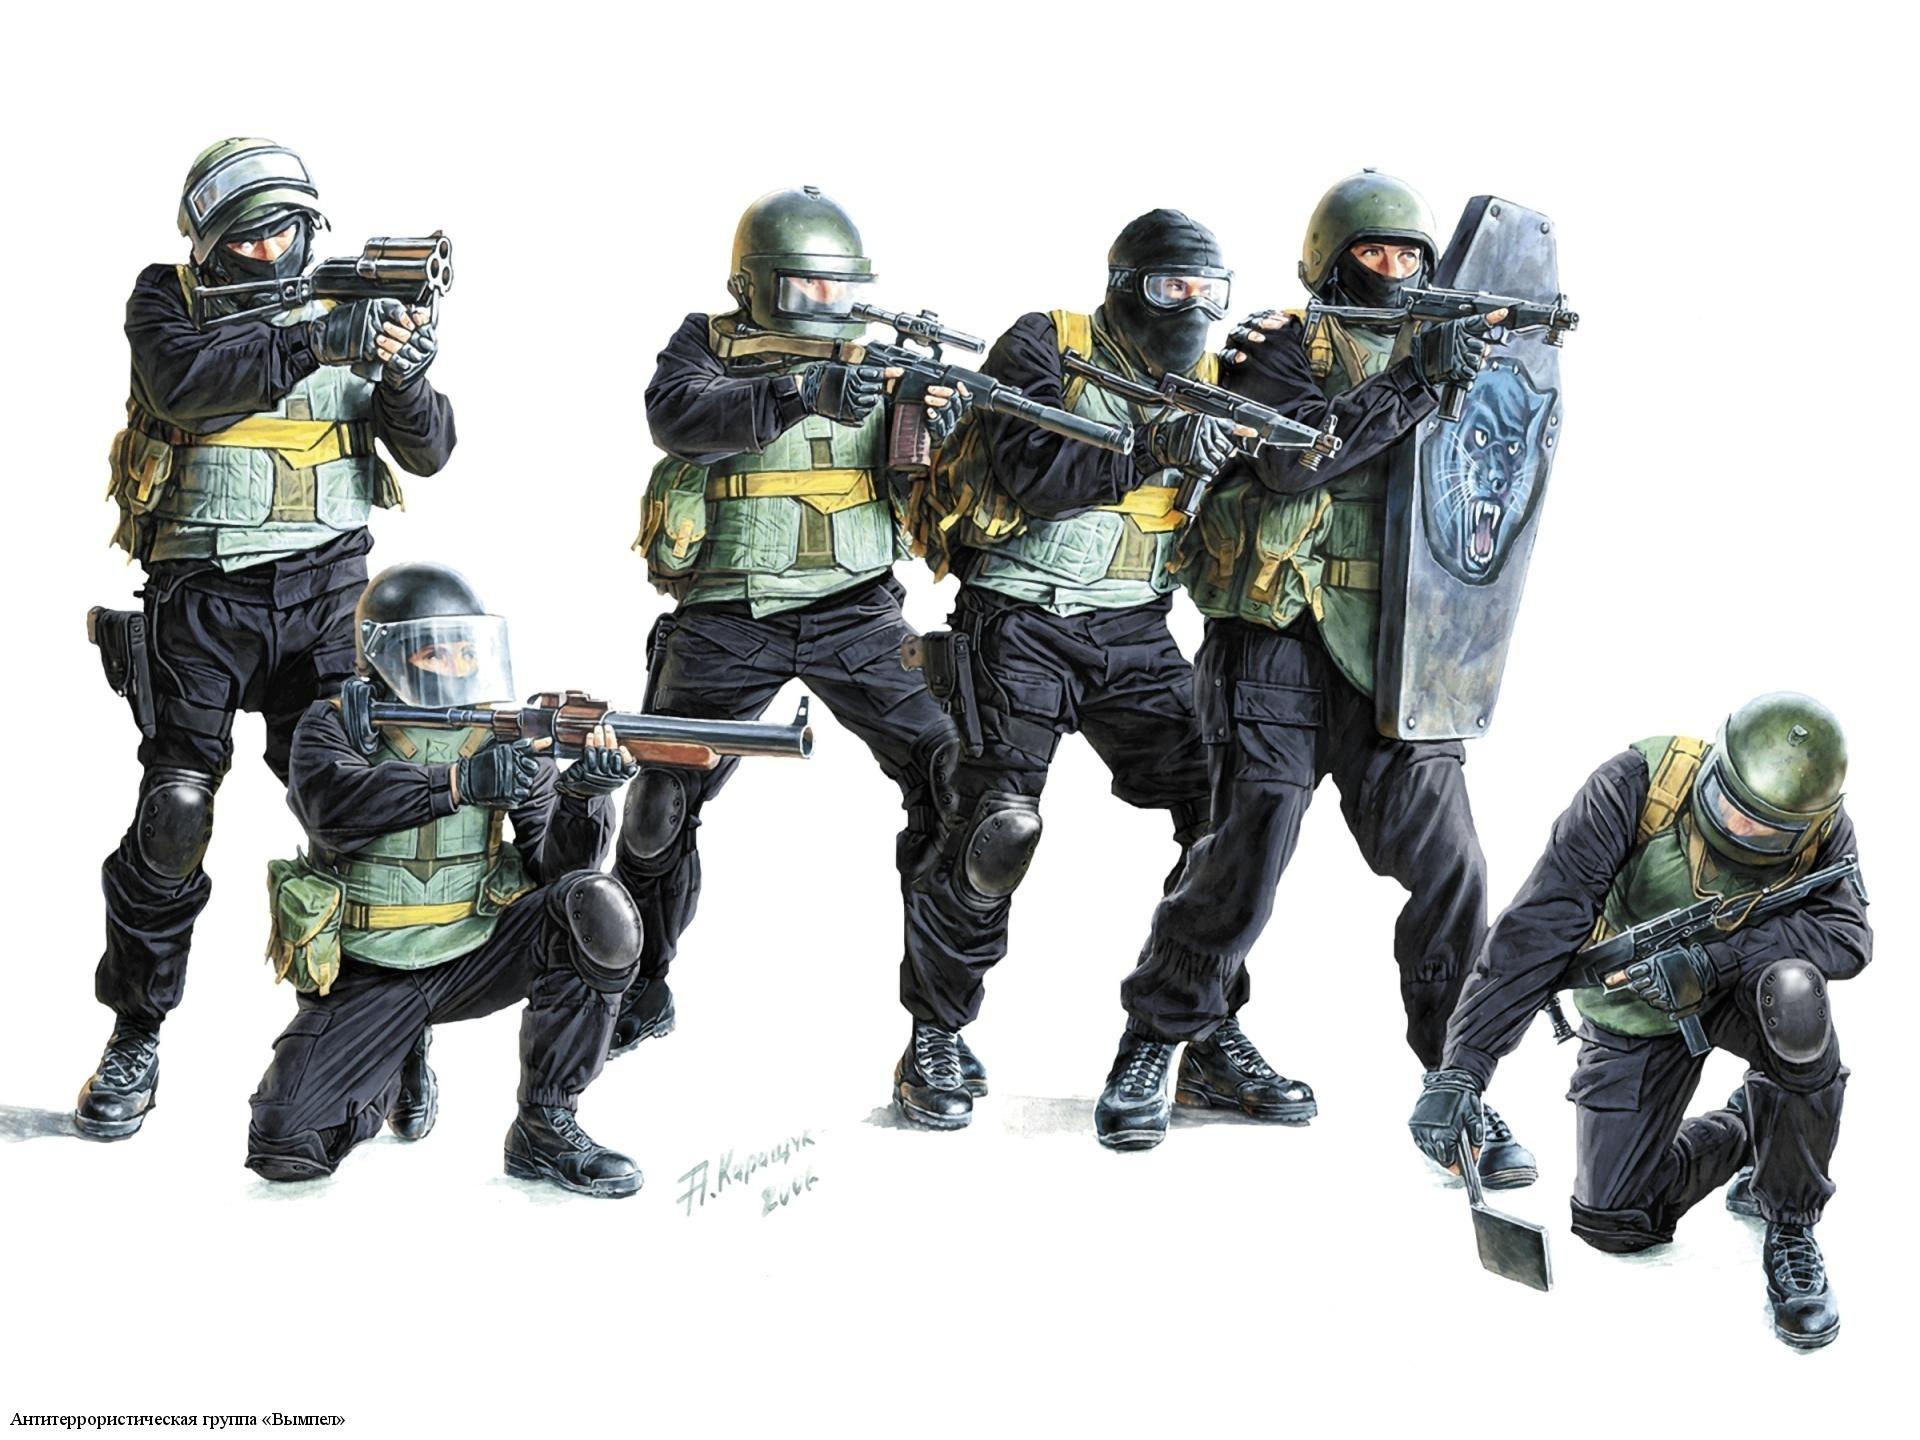 Swat Car Wallpaper 2560x1600 Soldier Hd Wallpaper Background Image 1920x1440 Id